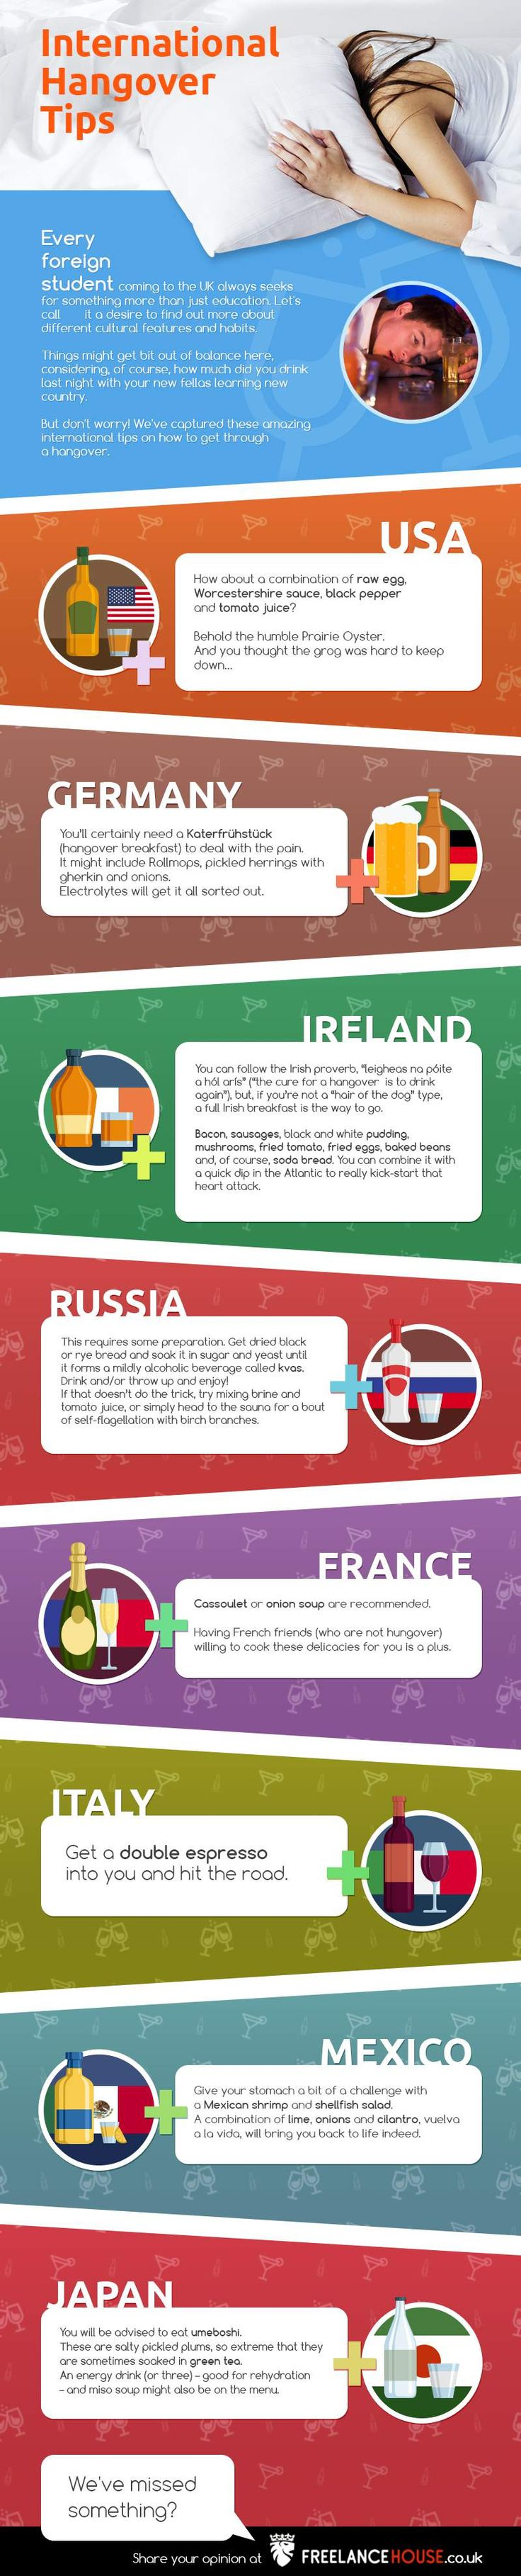 International Hangover Tips